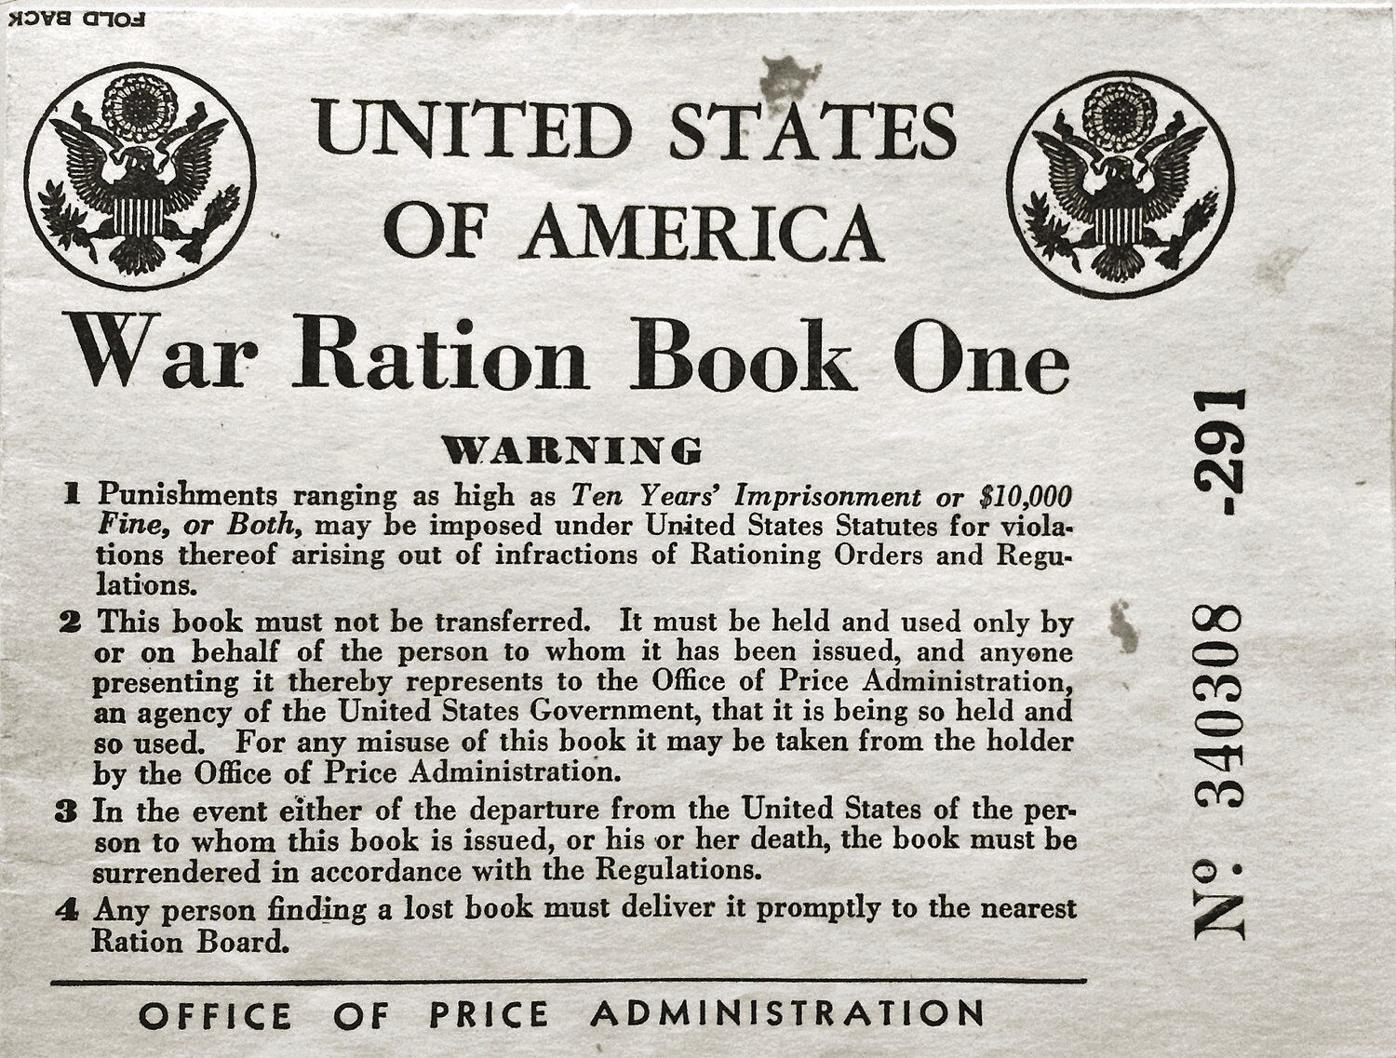 Brattleboro made World War II rationing a community effort